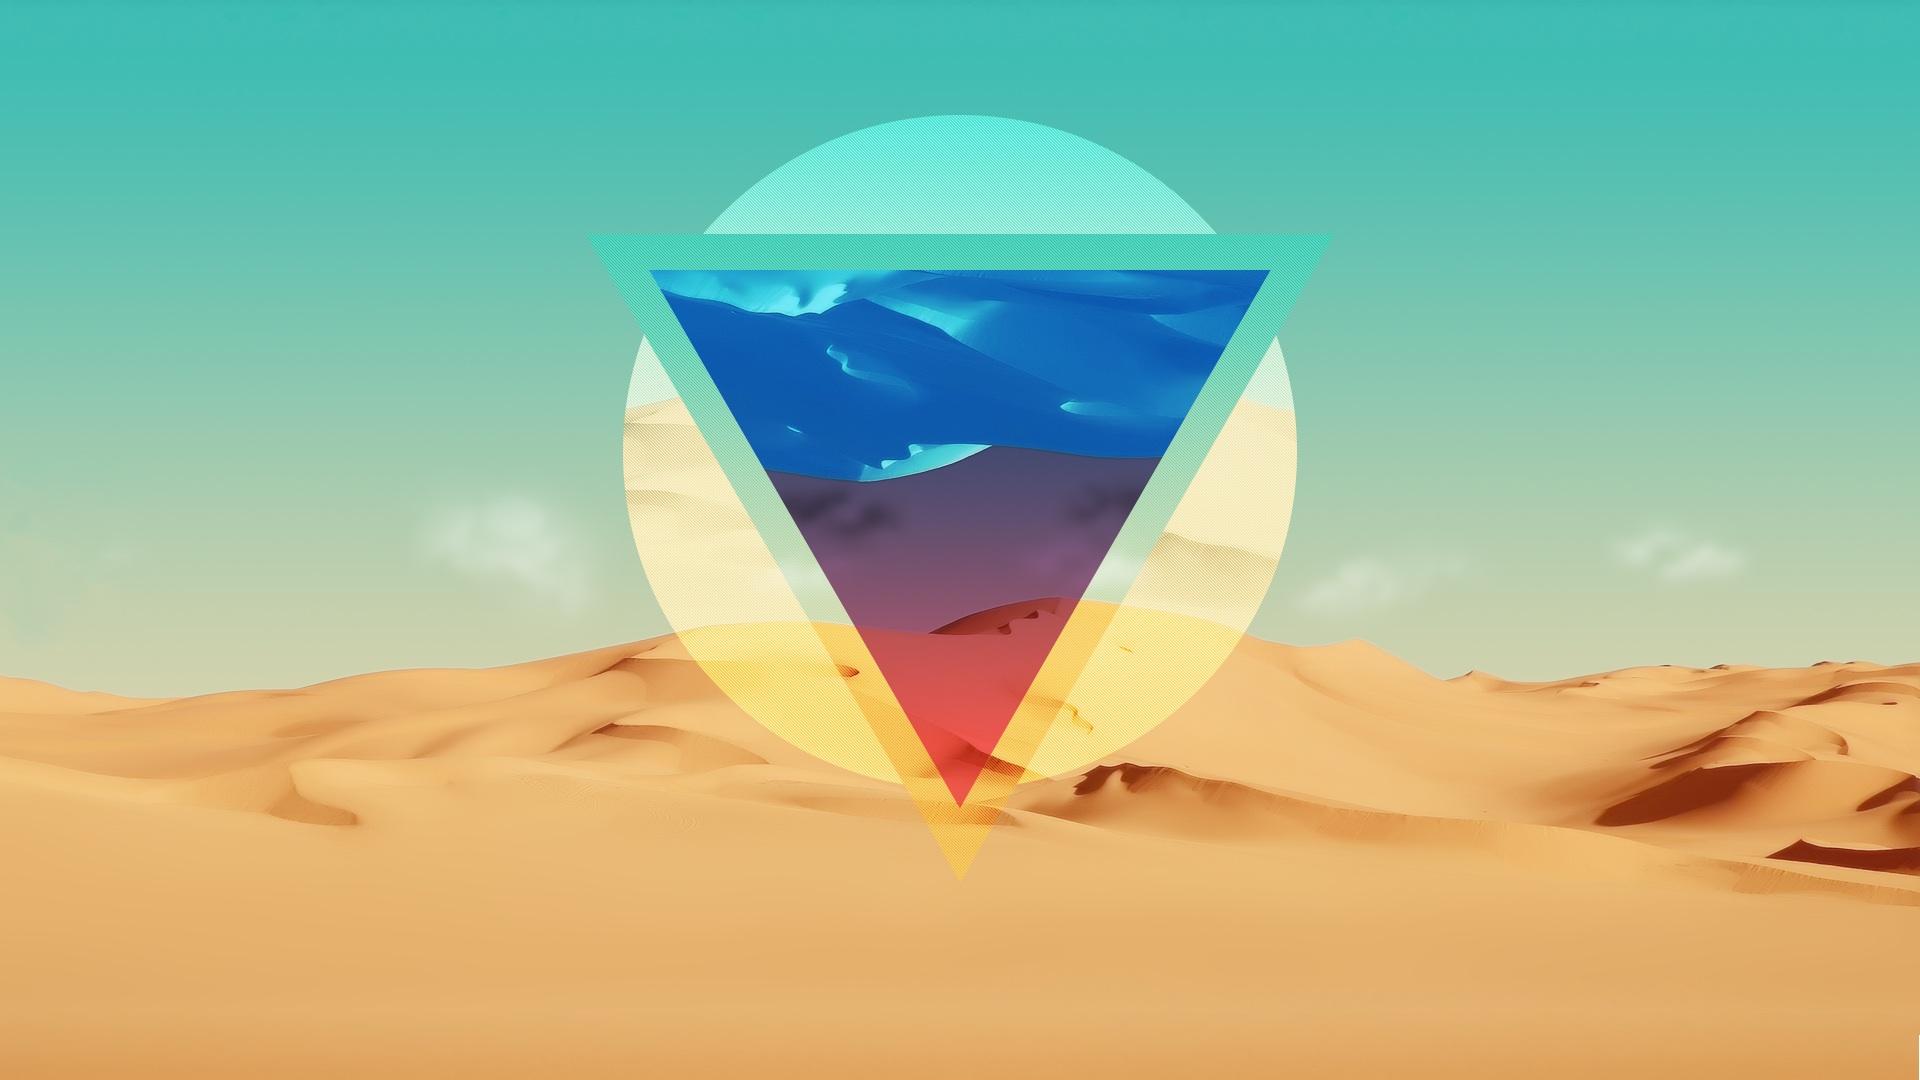 General 1920x1080 nature polyscape desert landscape artwork triangle shapes digital art simple